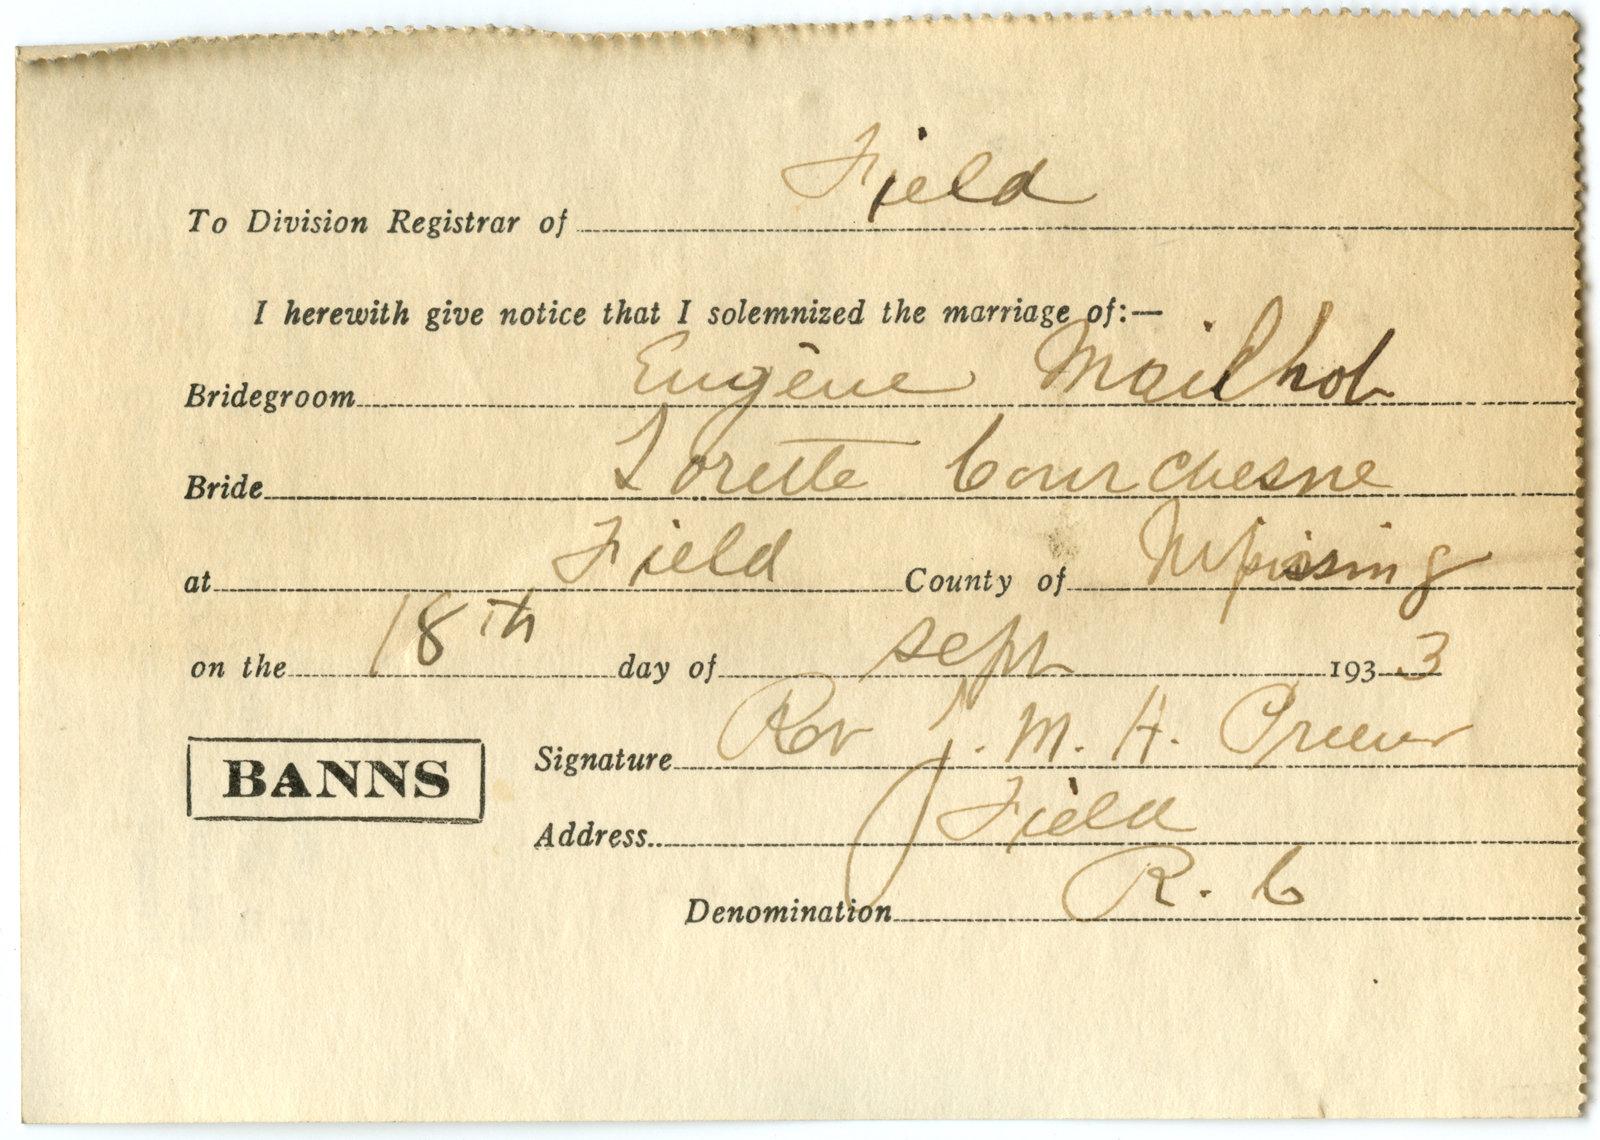 Certificat de mariage de / Marriage certificate of Eugène Mailhob & Lorette Courchesne